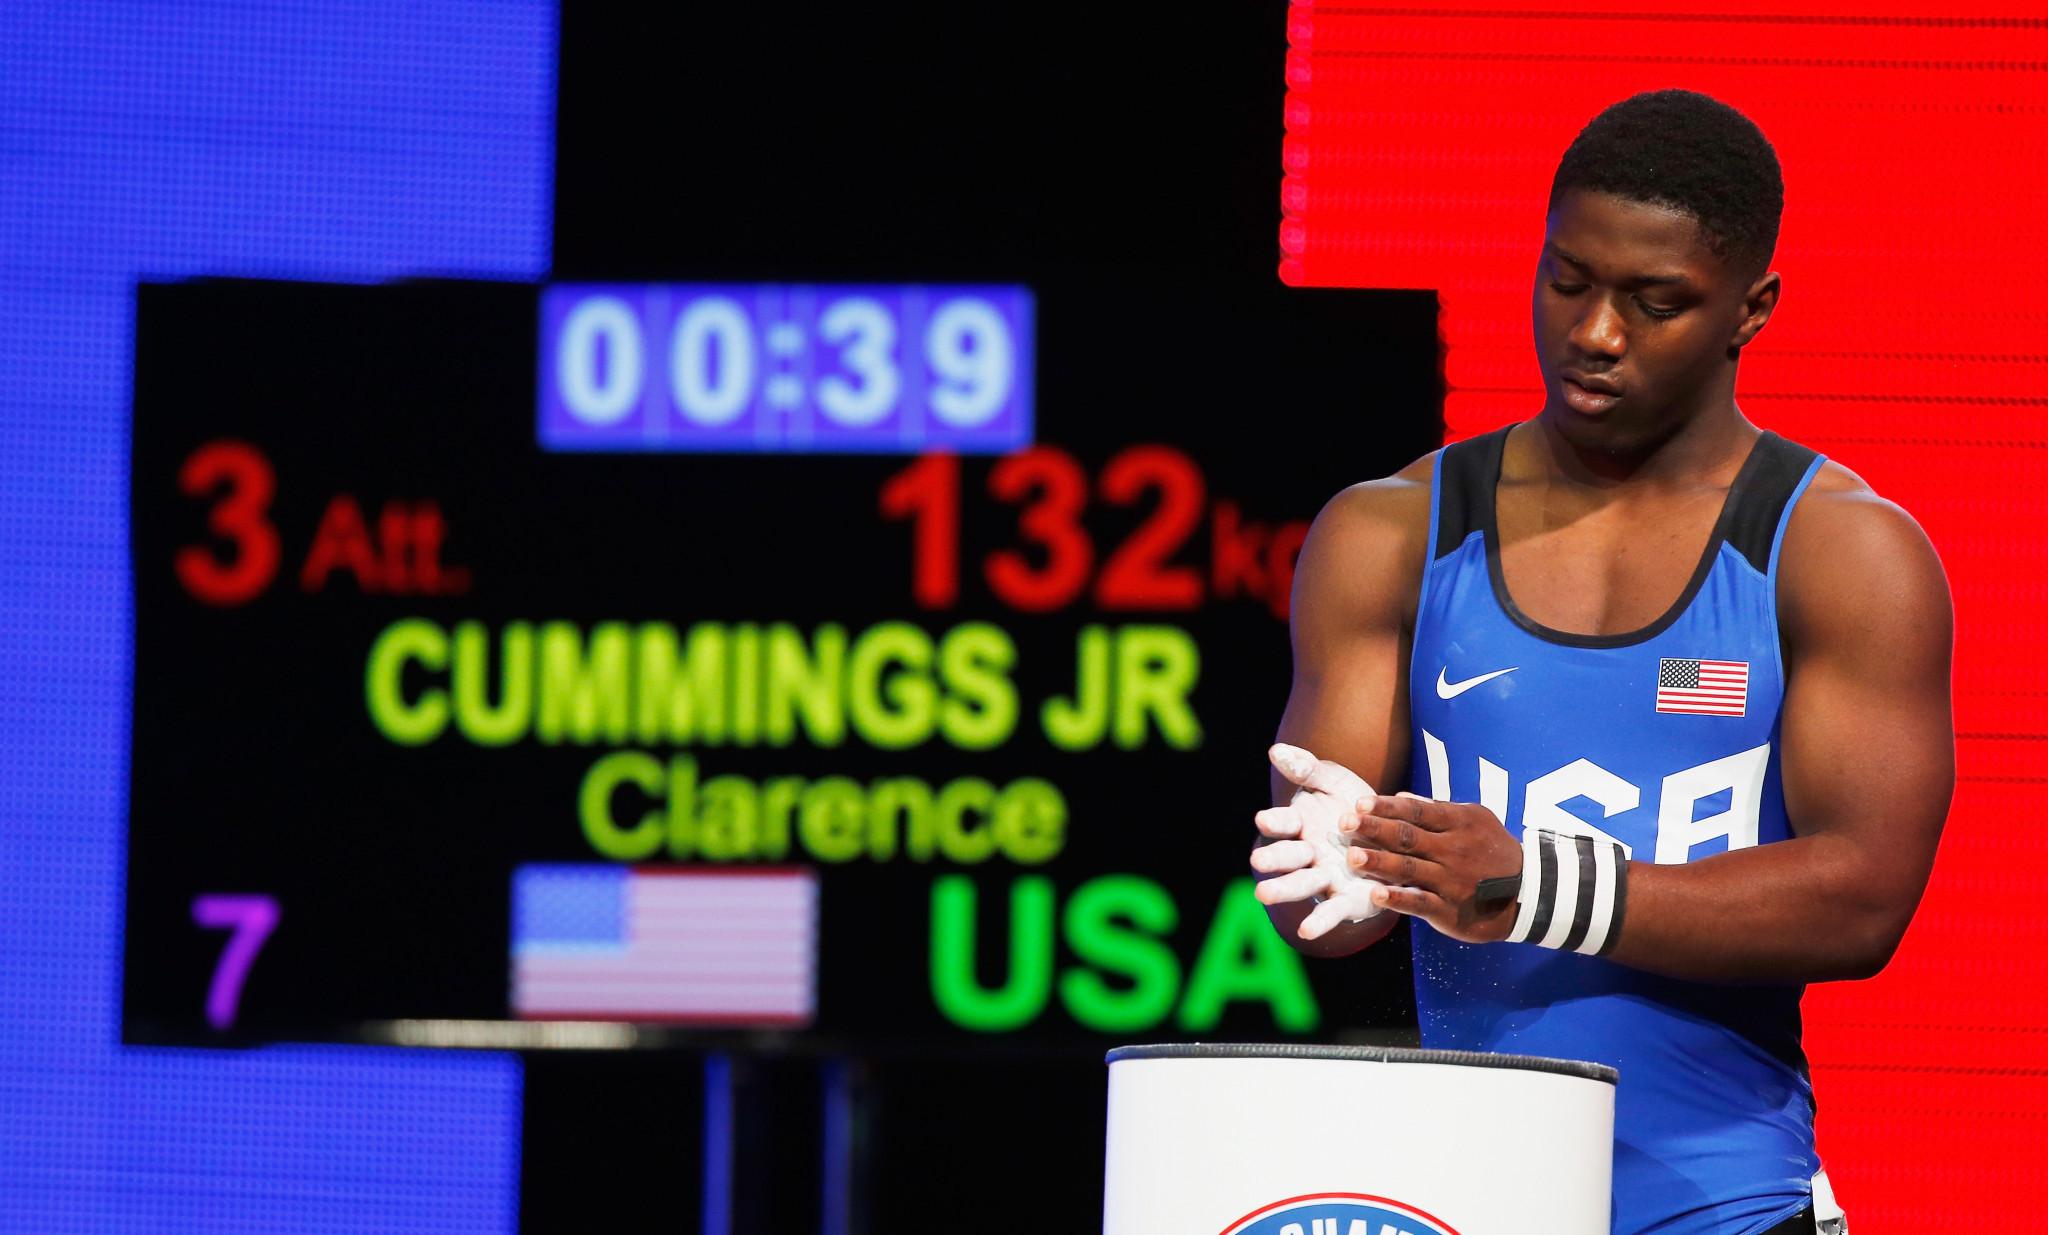 Cummings Jr earns third straight title at IWF Junior World Championships